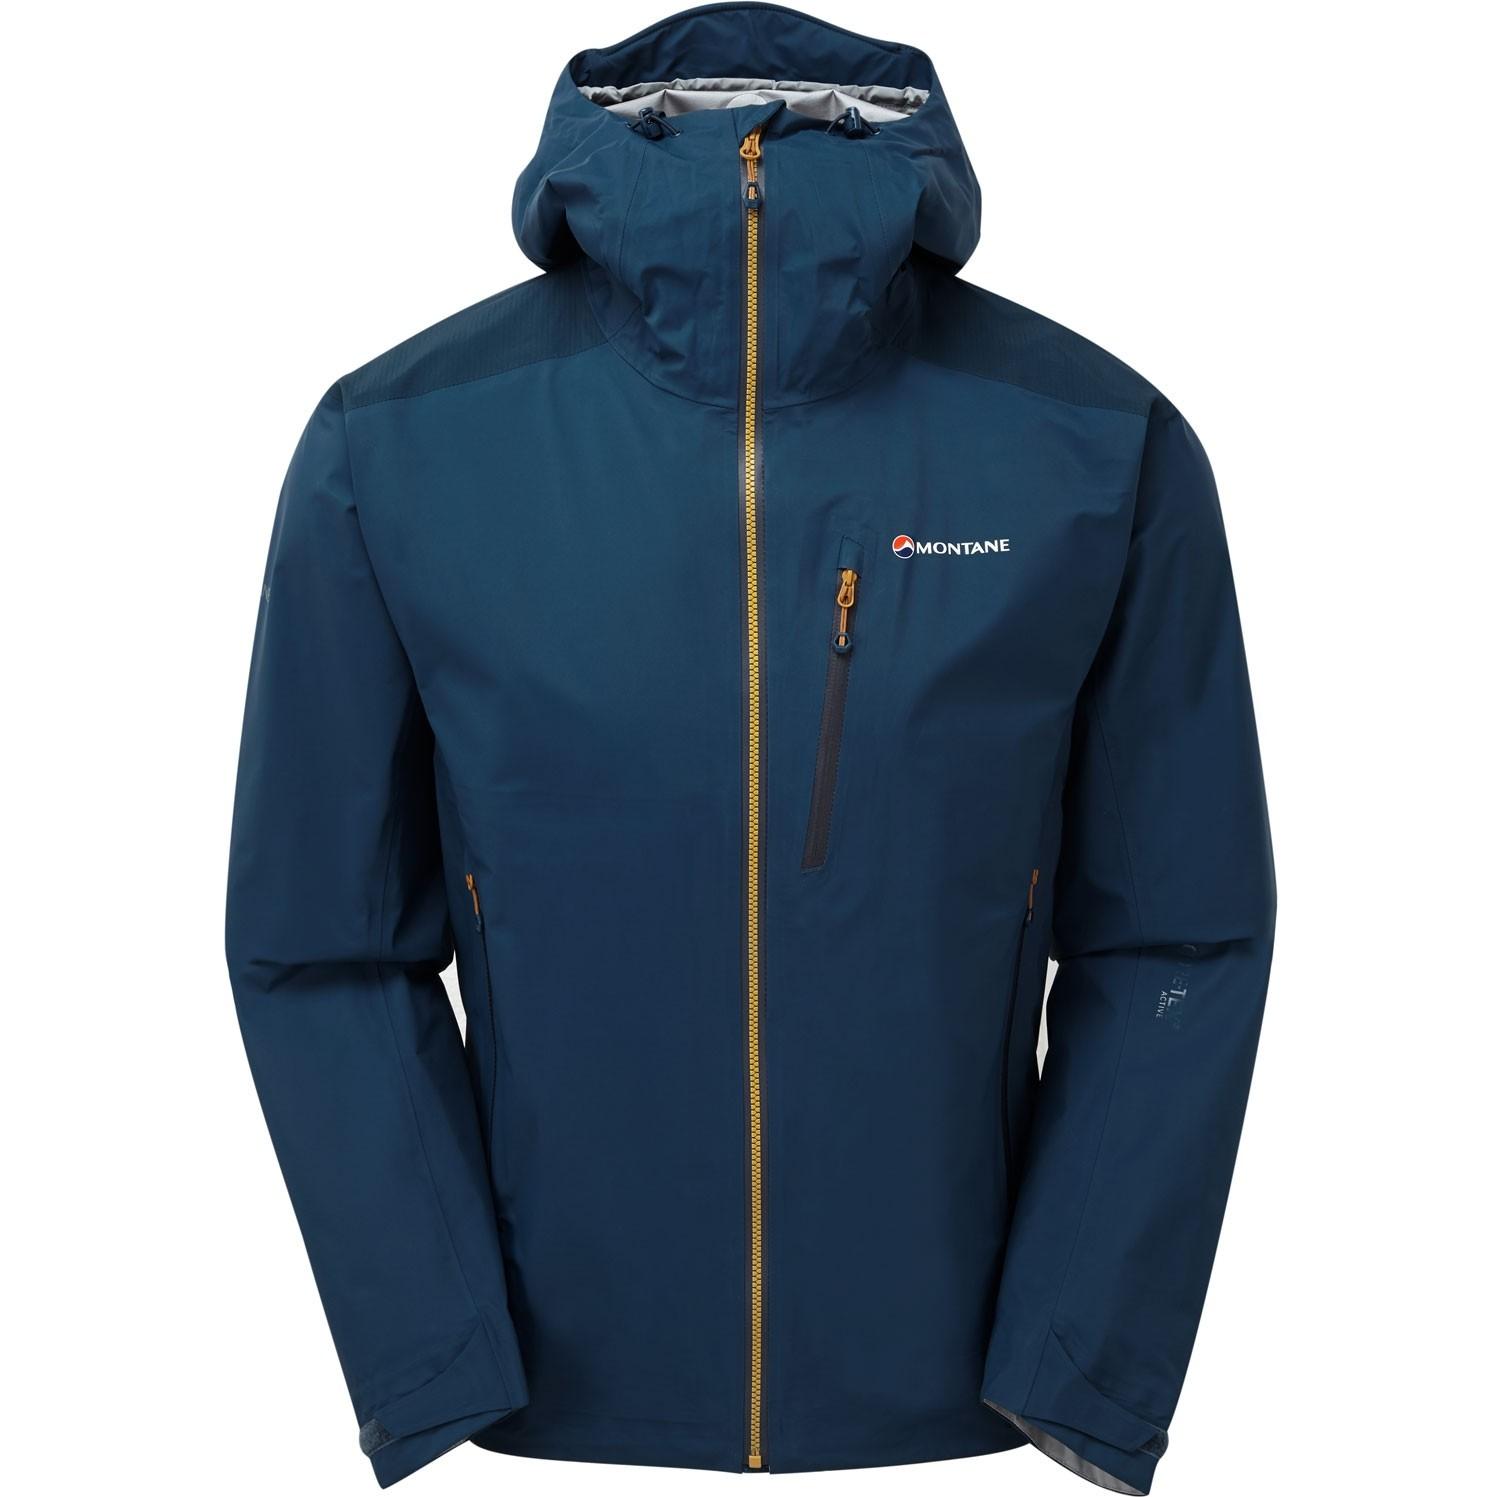 Montane Fleet Jacket - Narwhal Blue/Inca Gold